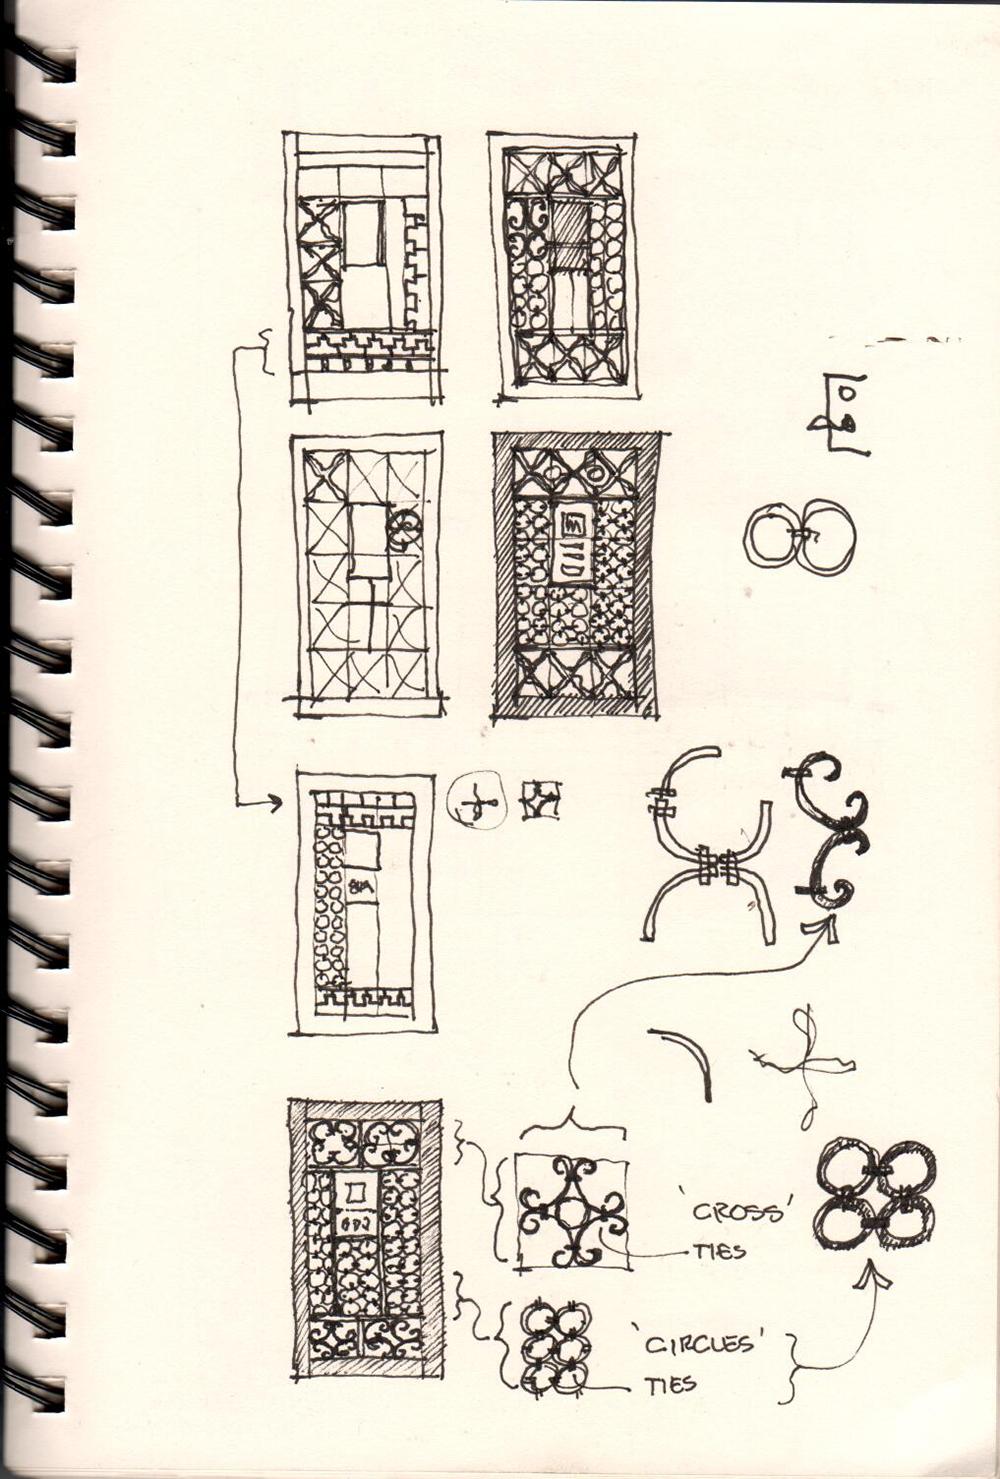 georgearchitecture_studio_mmw-gate_sketch02.jpg